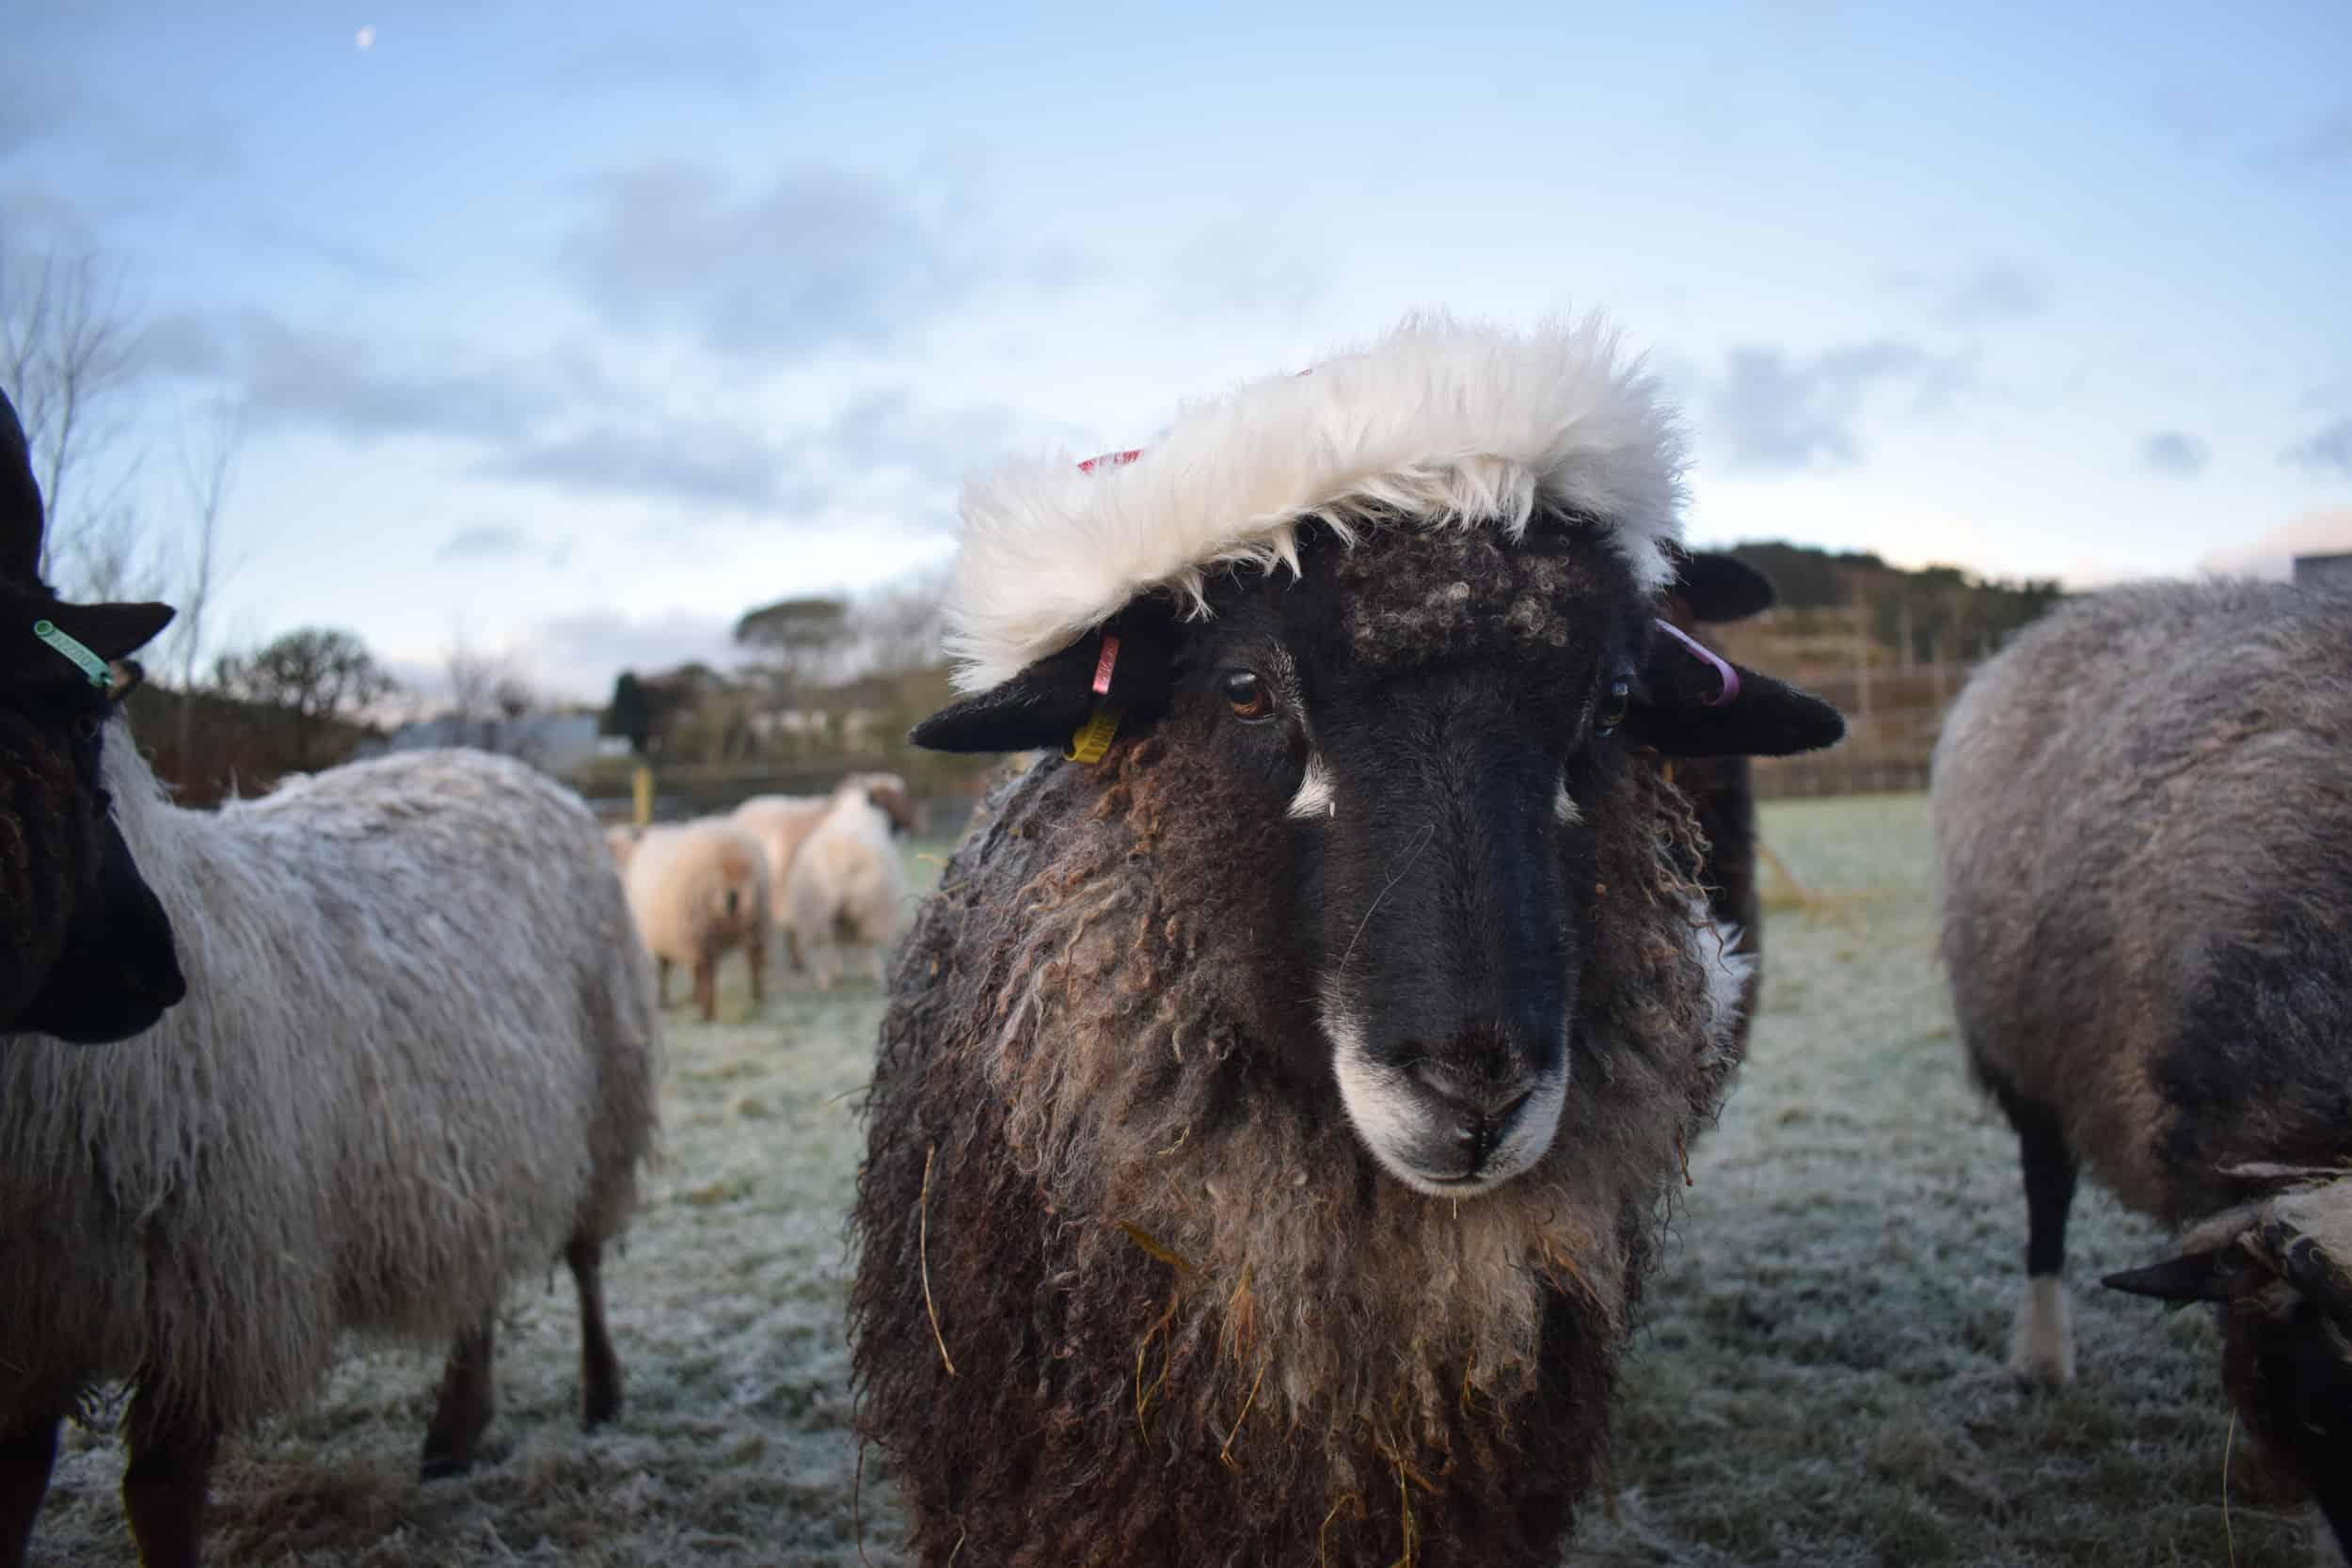 florence christmas sheep xmas santa hat coloured leicester longwool gotland shetland sheep crossbreed english blue kind fibre